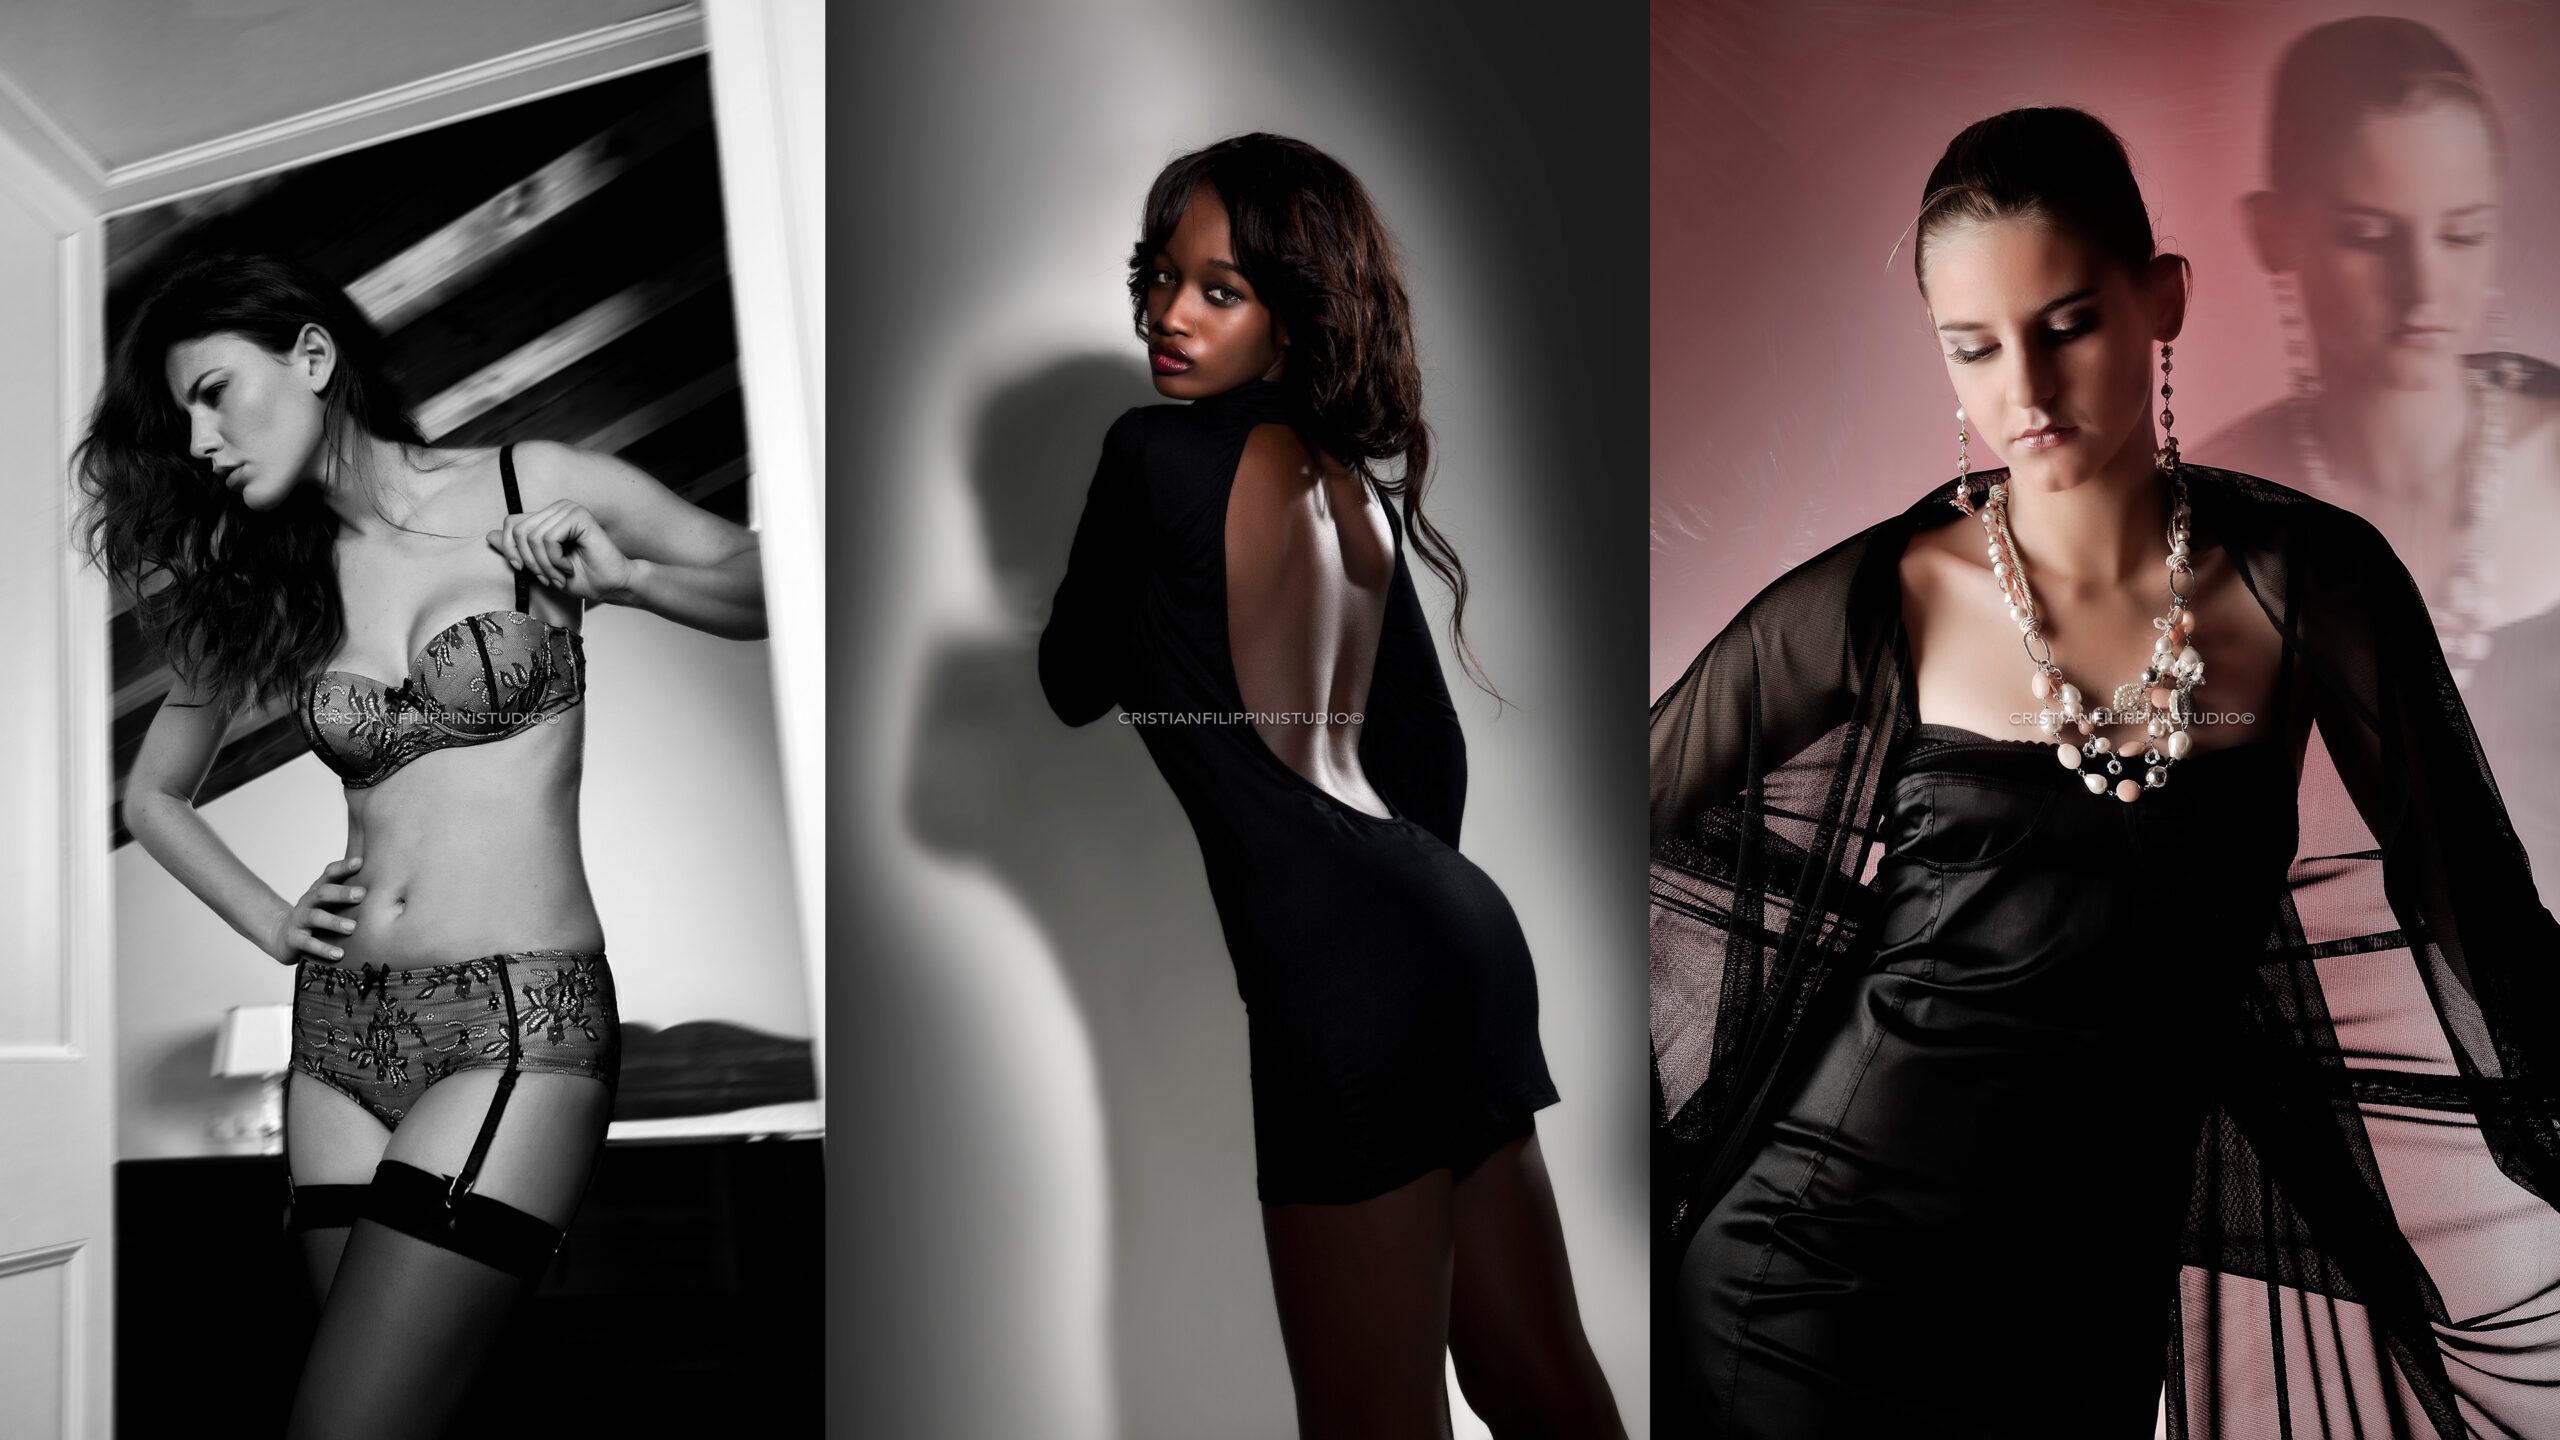 Fashion & Portrait Photography | Cristian Filippini Studio © Fine Art Photography Video & Advertising